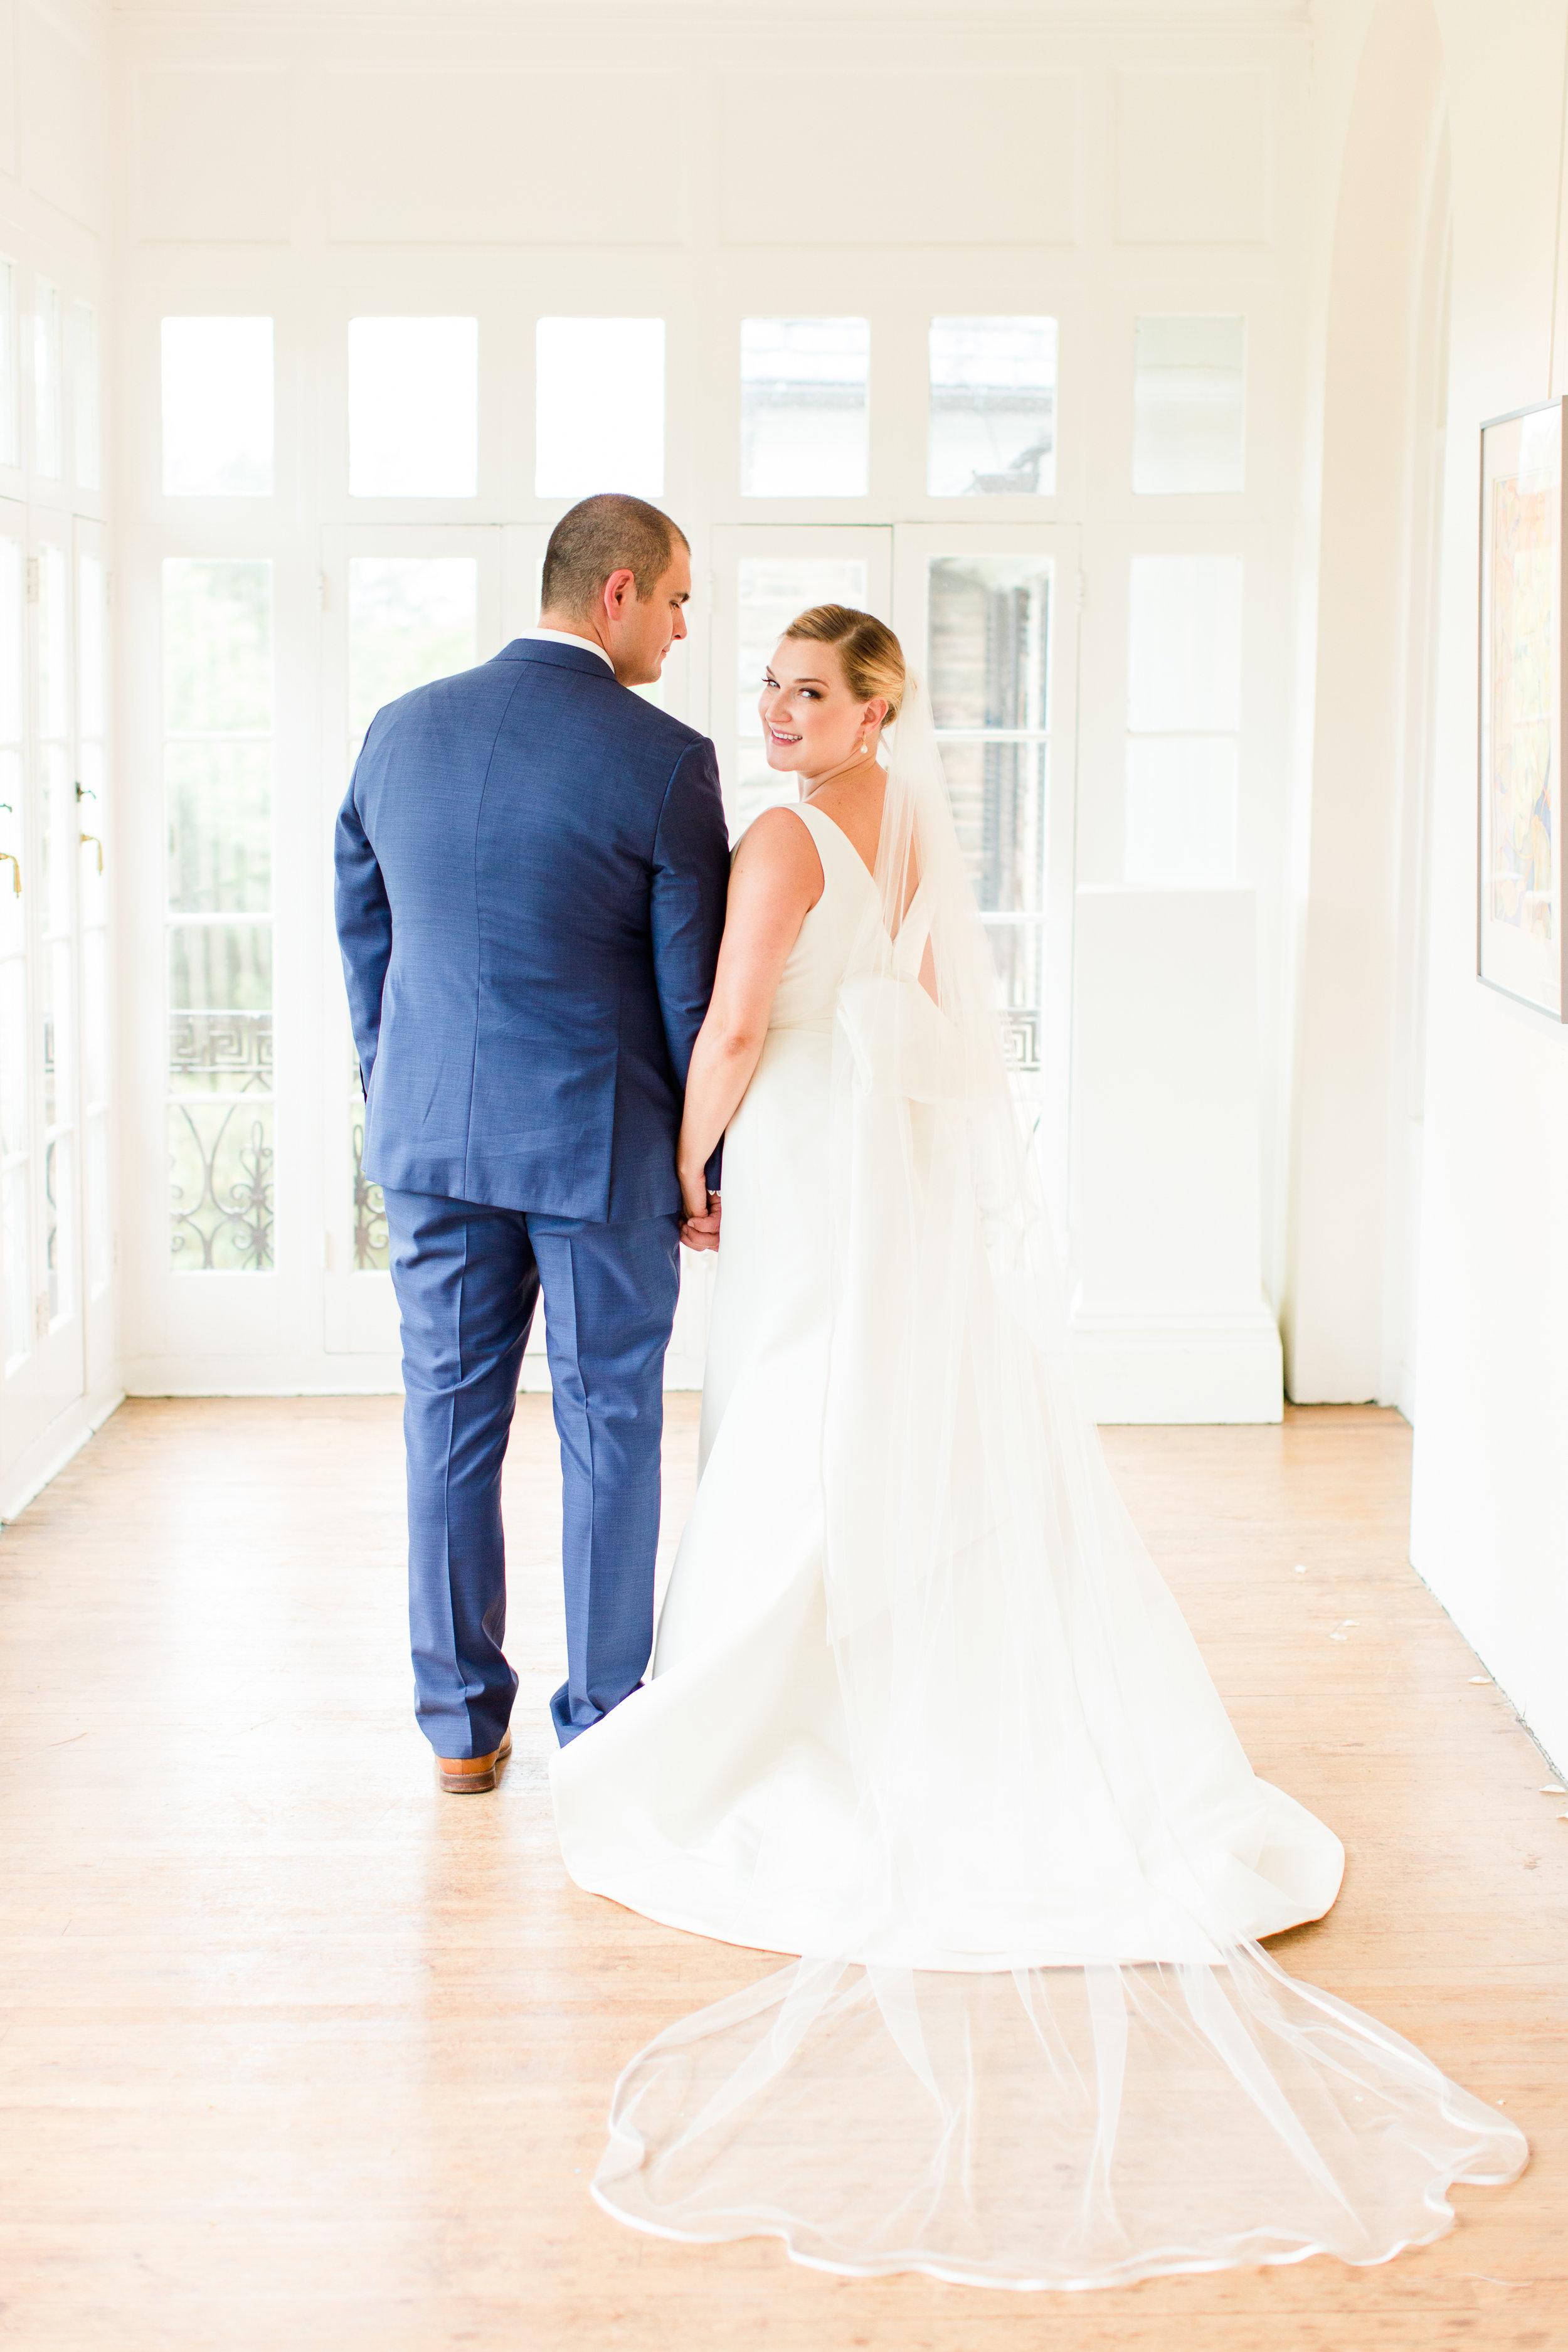 glenview-mansion-rockville-maryland-bourbon-derby-buker-wedding-bride-groom-portraitsbethanne-arthur-photography-photos-135.jpg